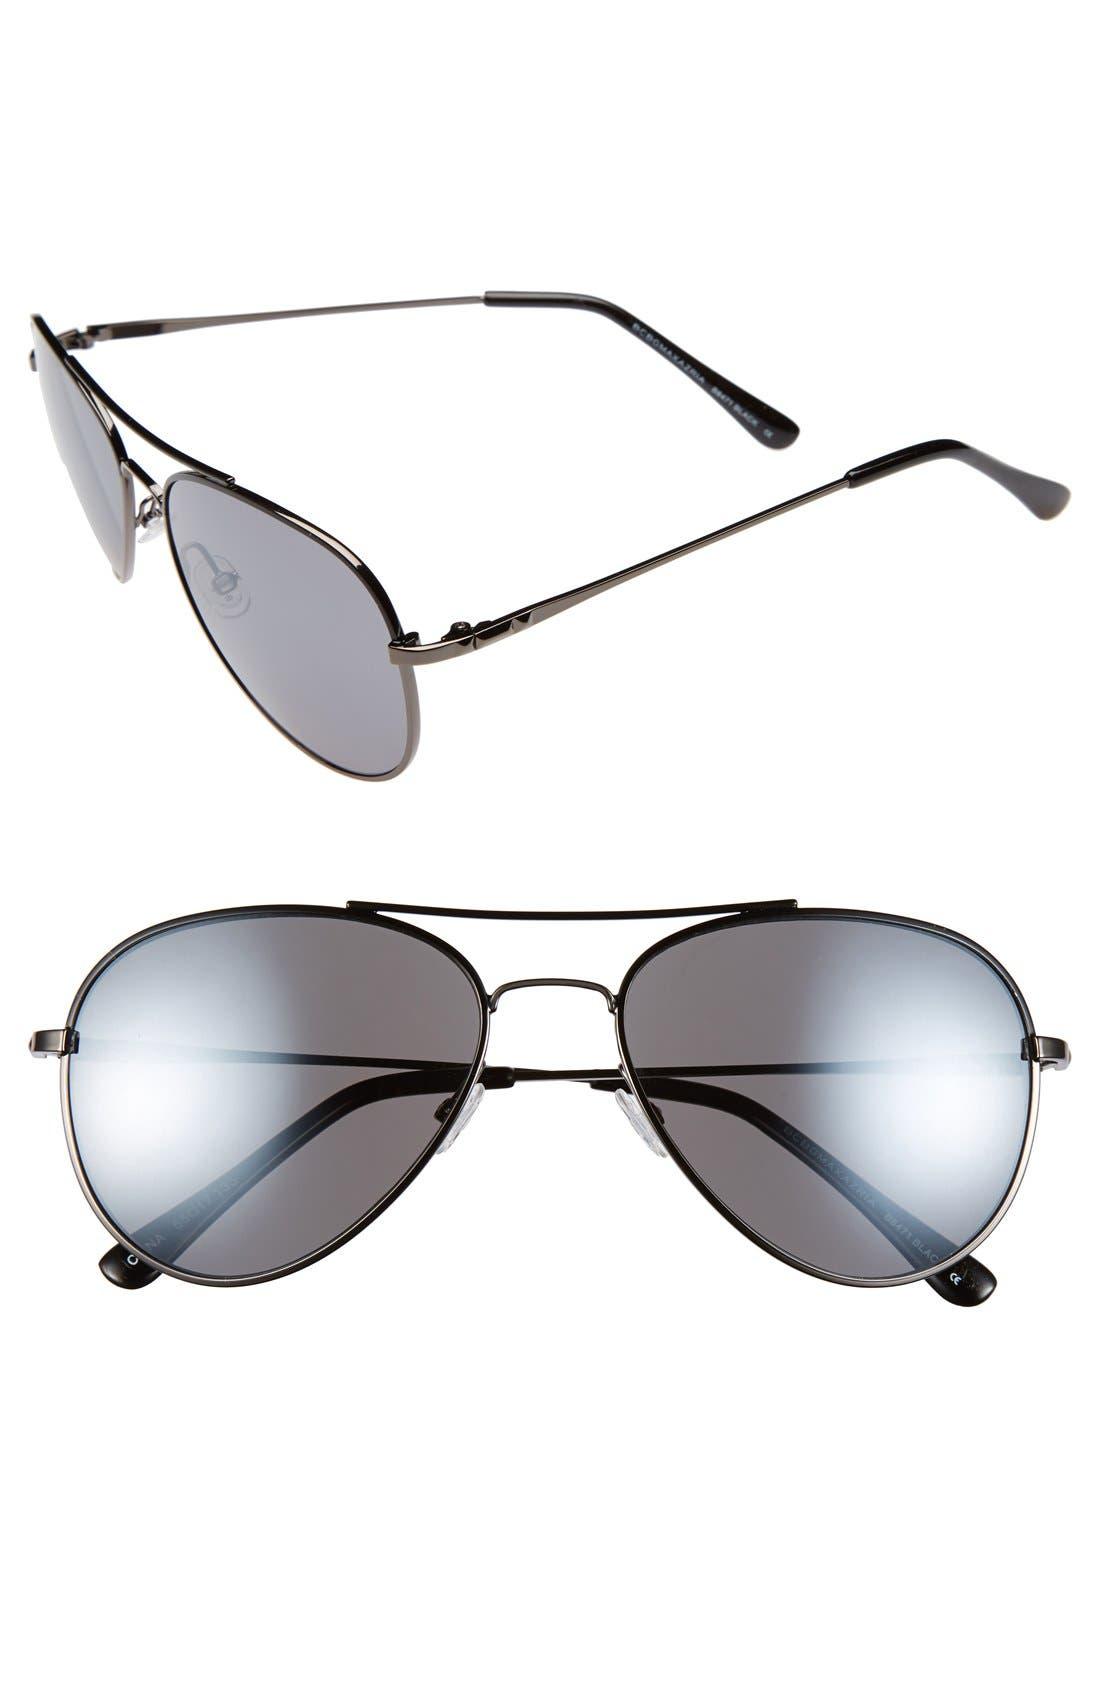 BCBGMAXAZRIA 55mm Aviator Sunglasses, Main, color, 001